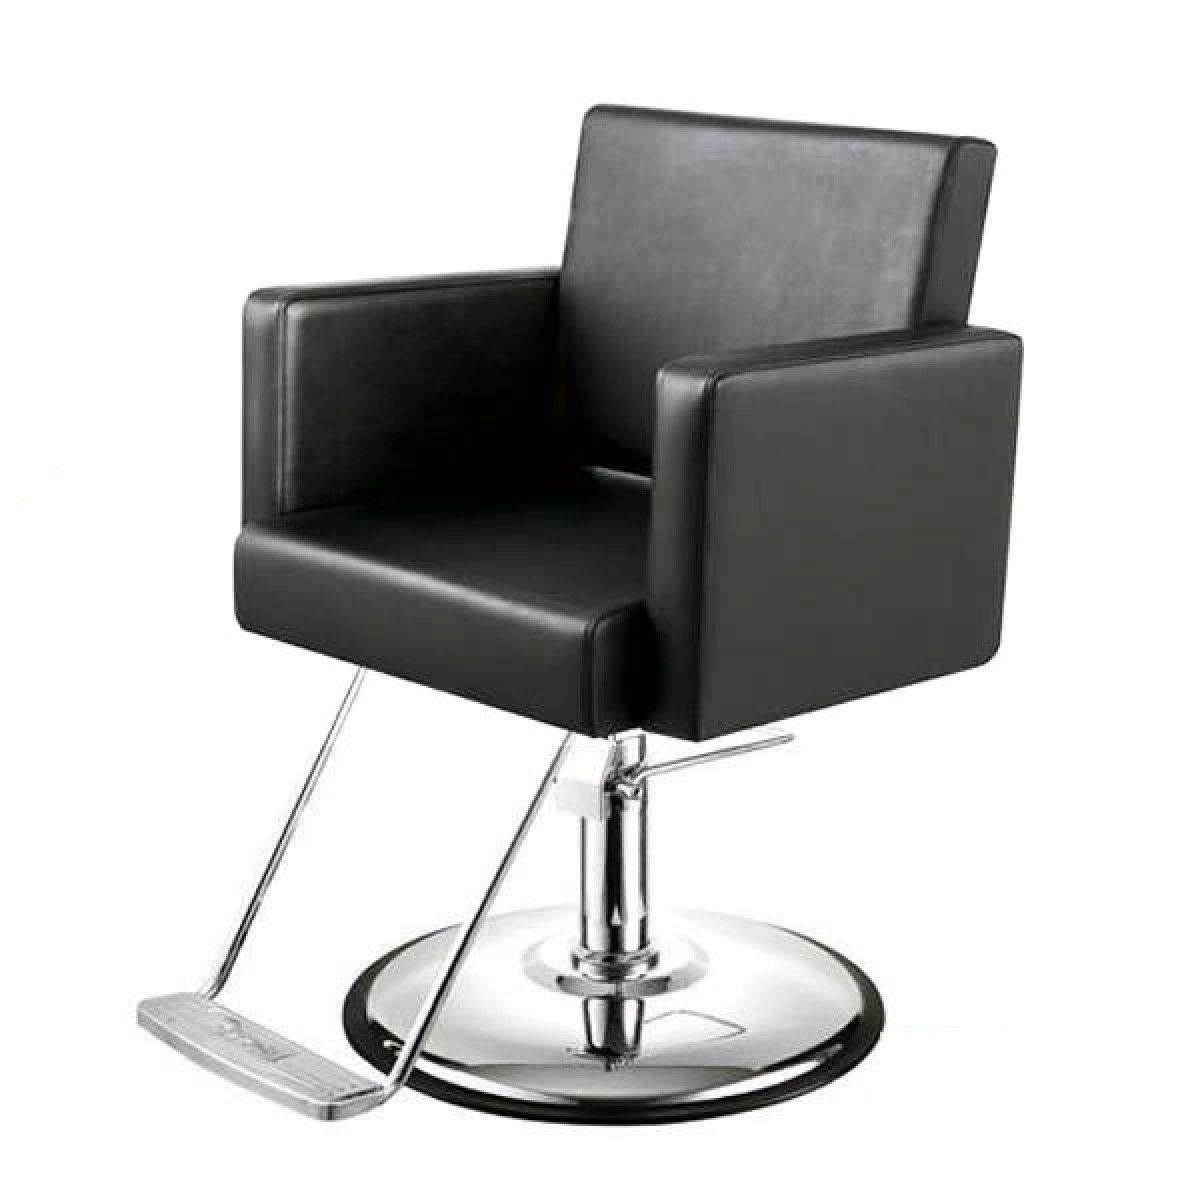 Canon Styling Chair Salon Chairs Salon Equipment Salon Styling Chairs Salon Chairs Hair Salon Chairs